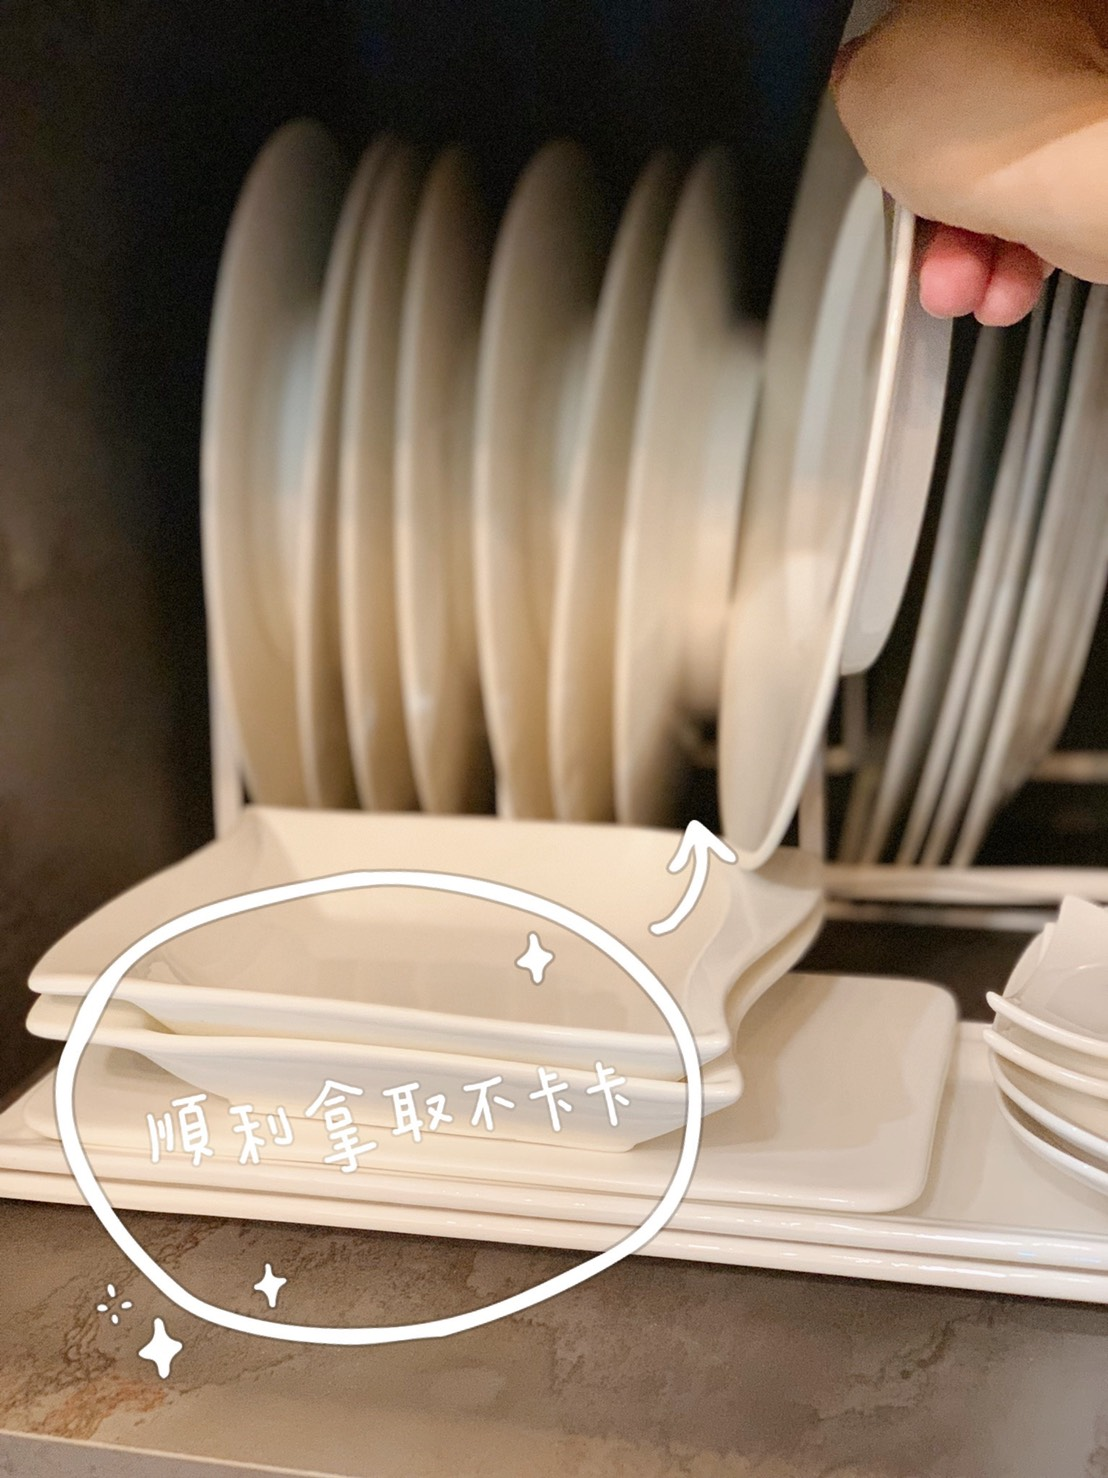 tower三格日系框型盤架(白) 山崎收納 Yamazaki 廚房收納 盤架 直立式收納